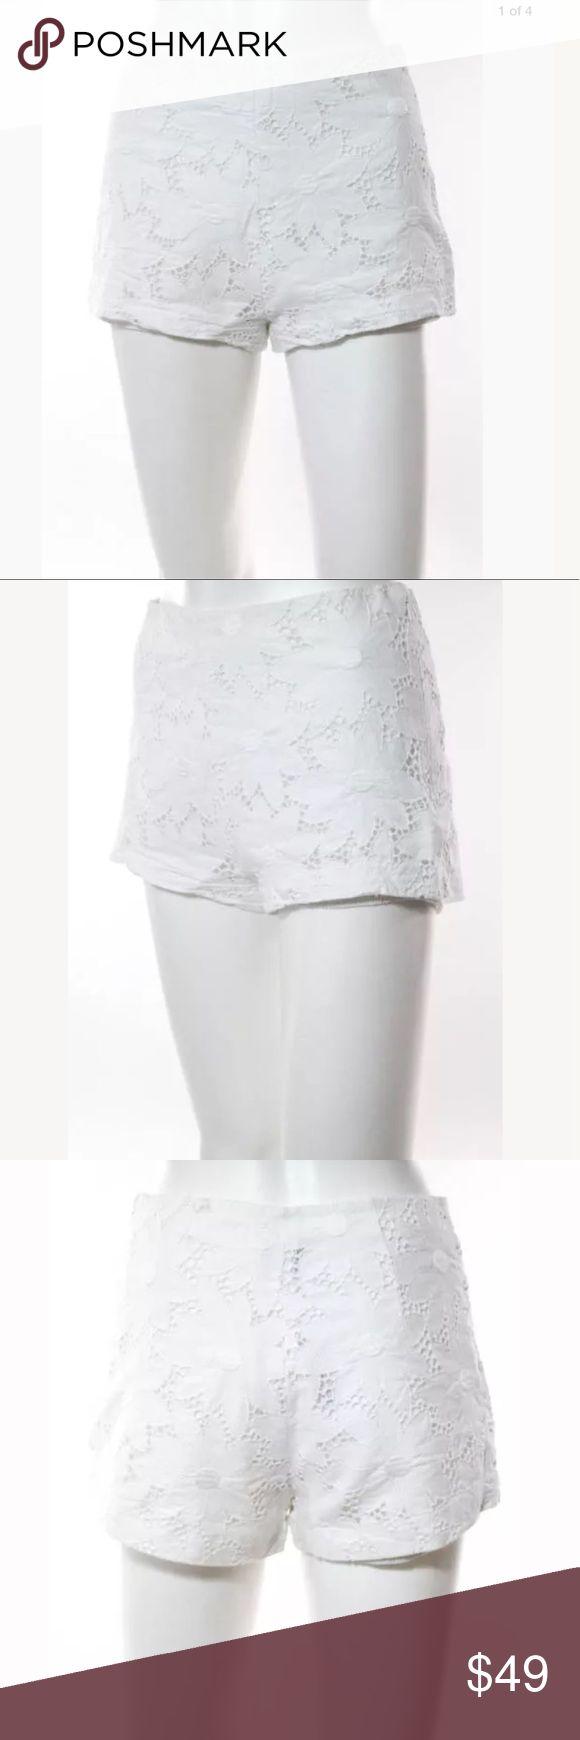 Lisa Perry white lace shorts Sz 8 nwot White lace shorts nwot lisa perry Shorts